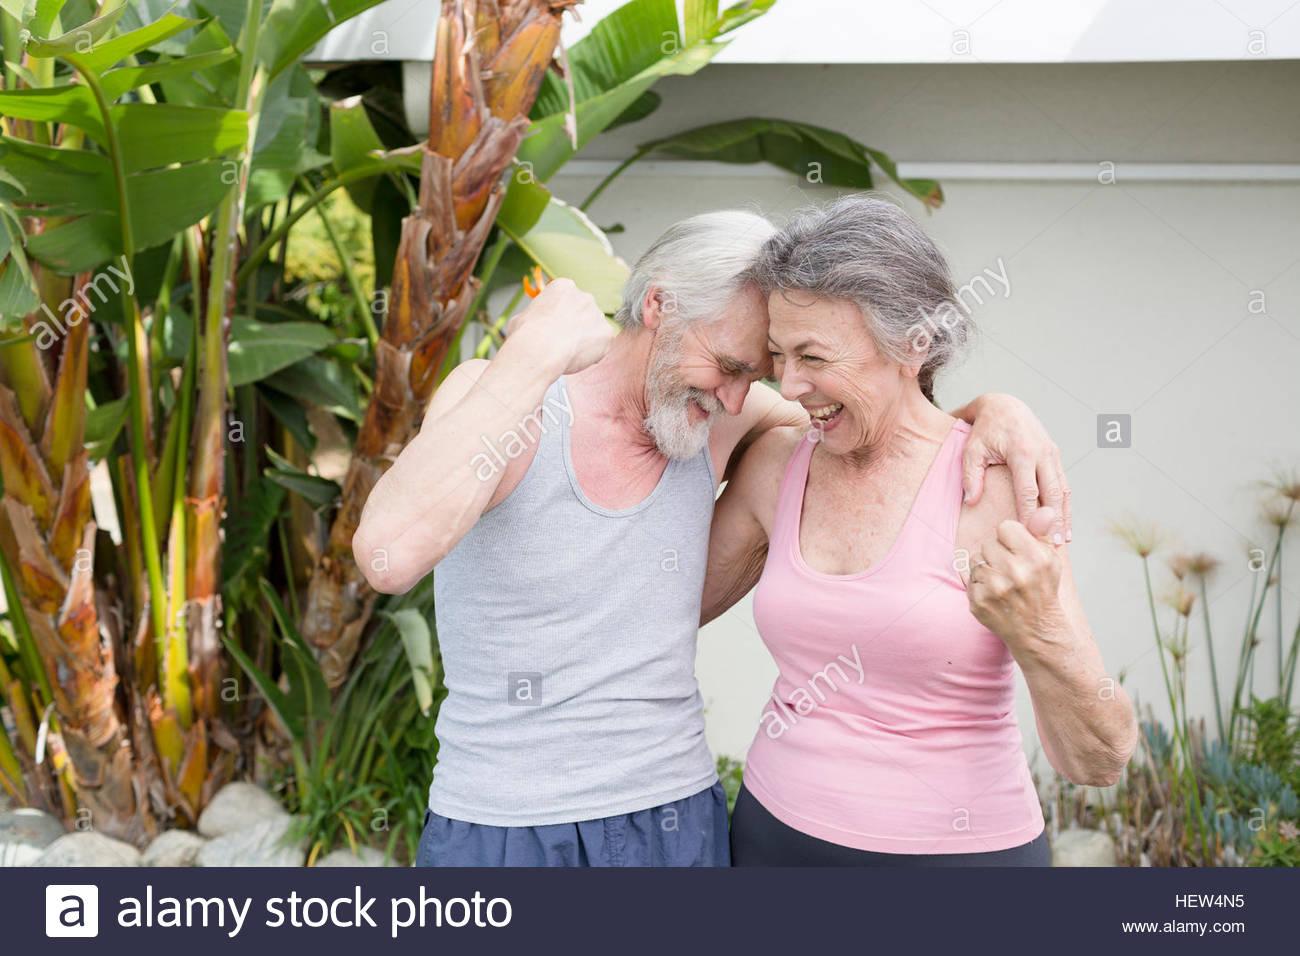 Youthful exercising senior couple laughing in garden - Stock Image